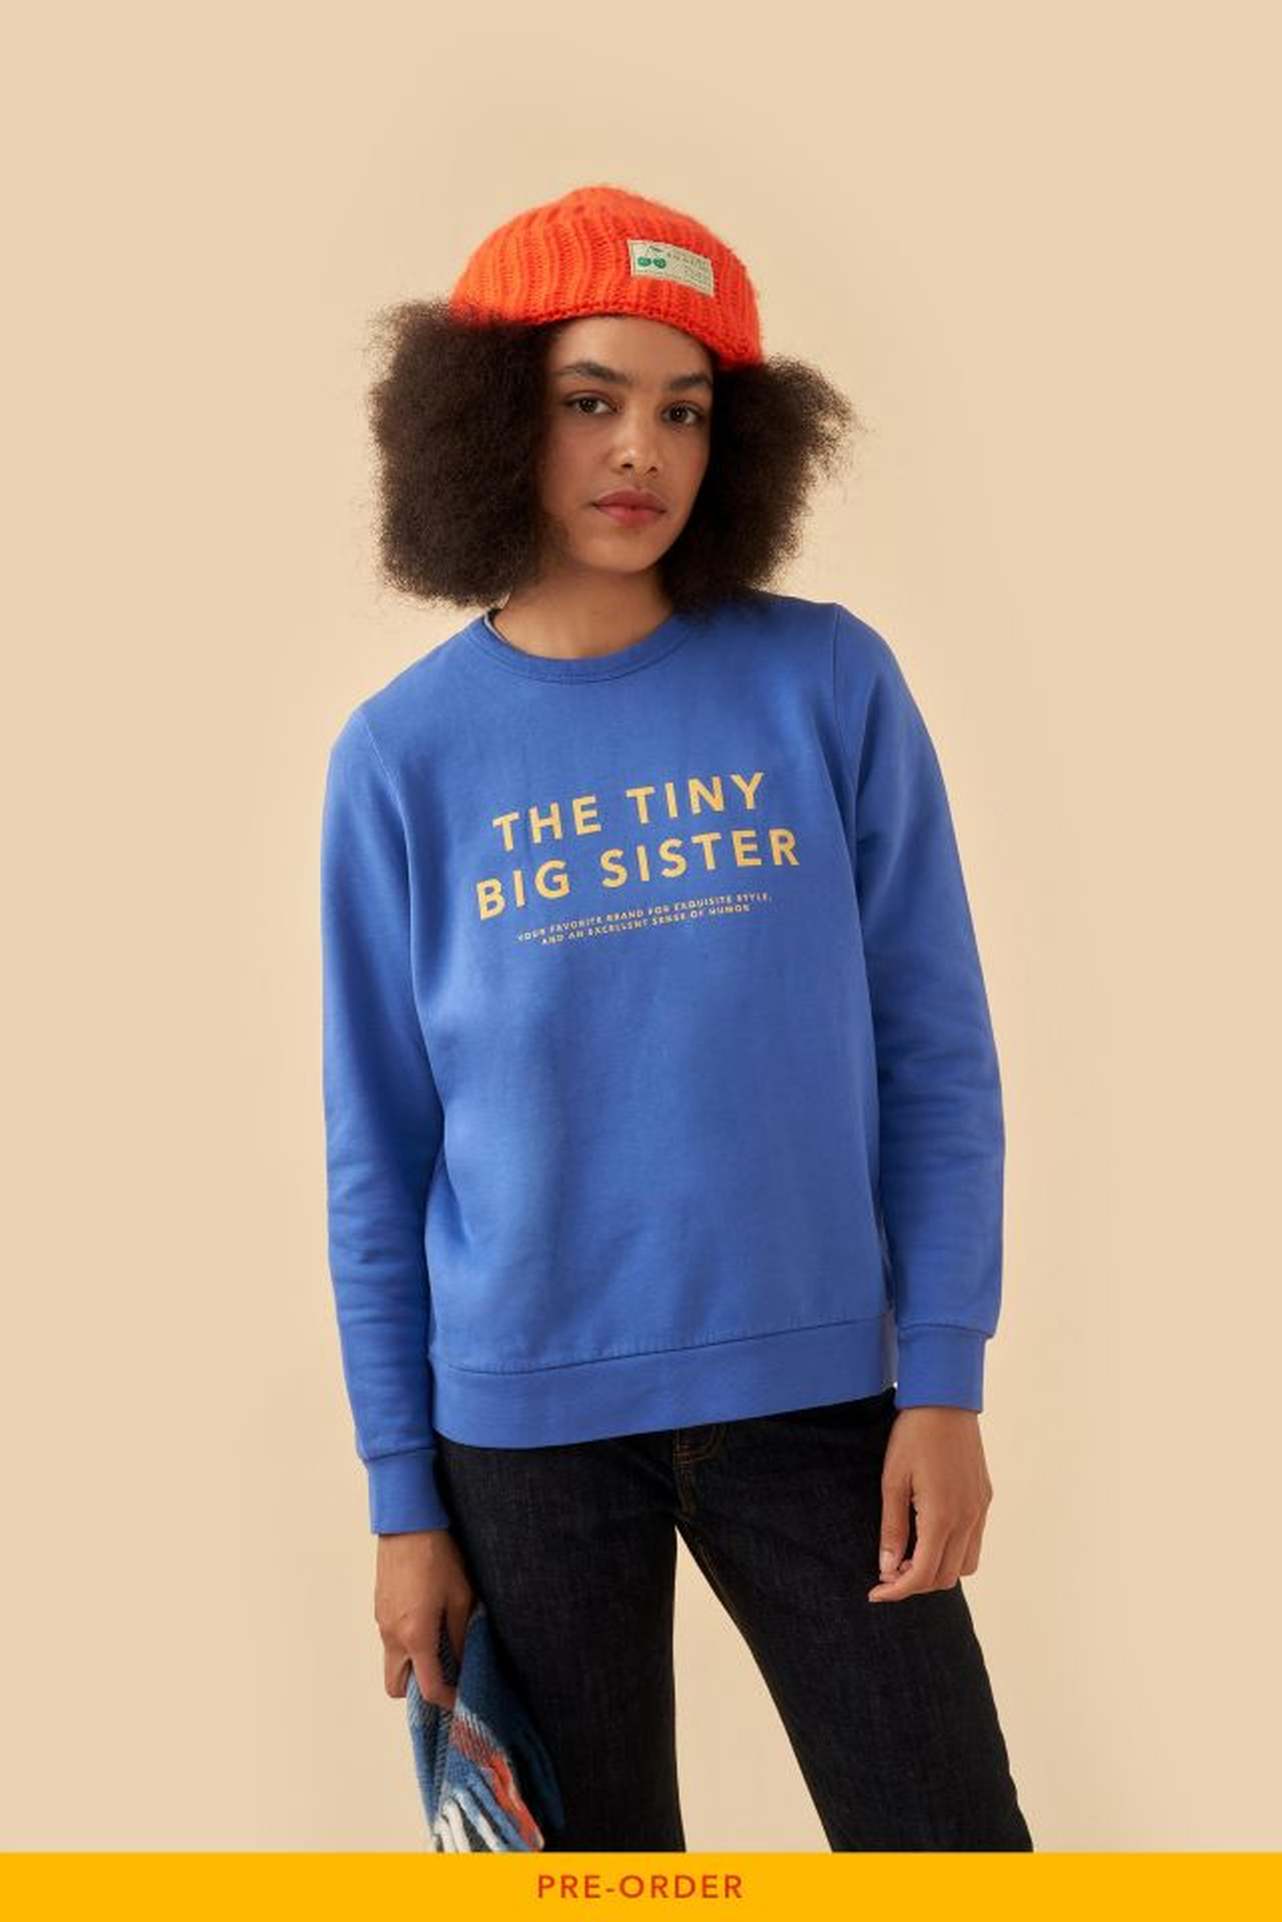 WOMAN THE TINY BIG SISTER SWEATSHIRT